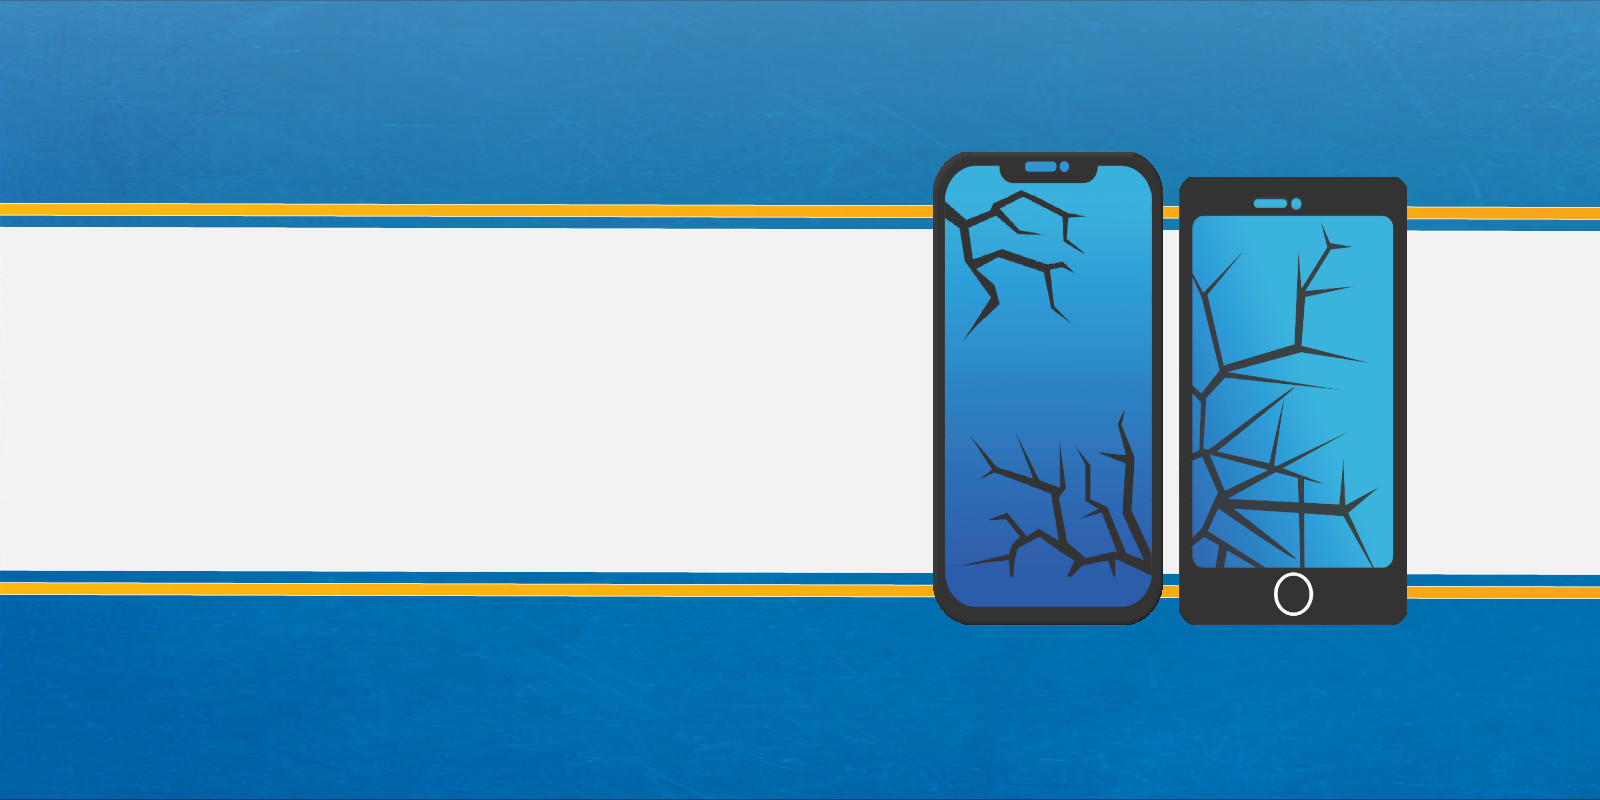 All iPhone Screen Repairs On Sale Now at iMaster Repair